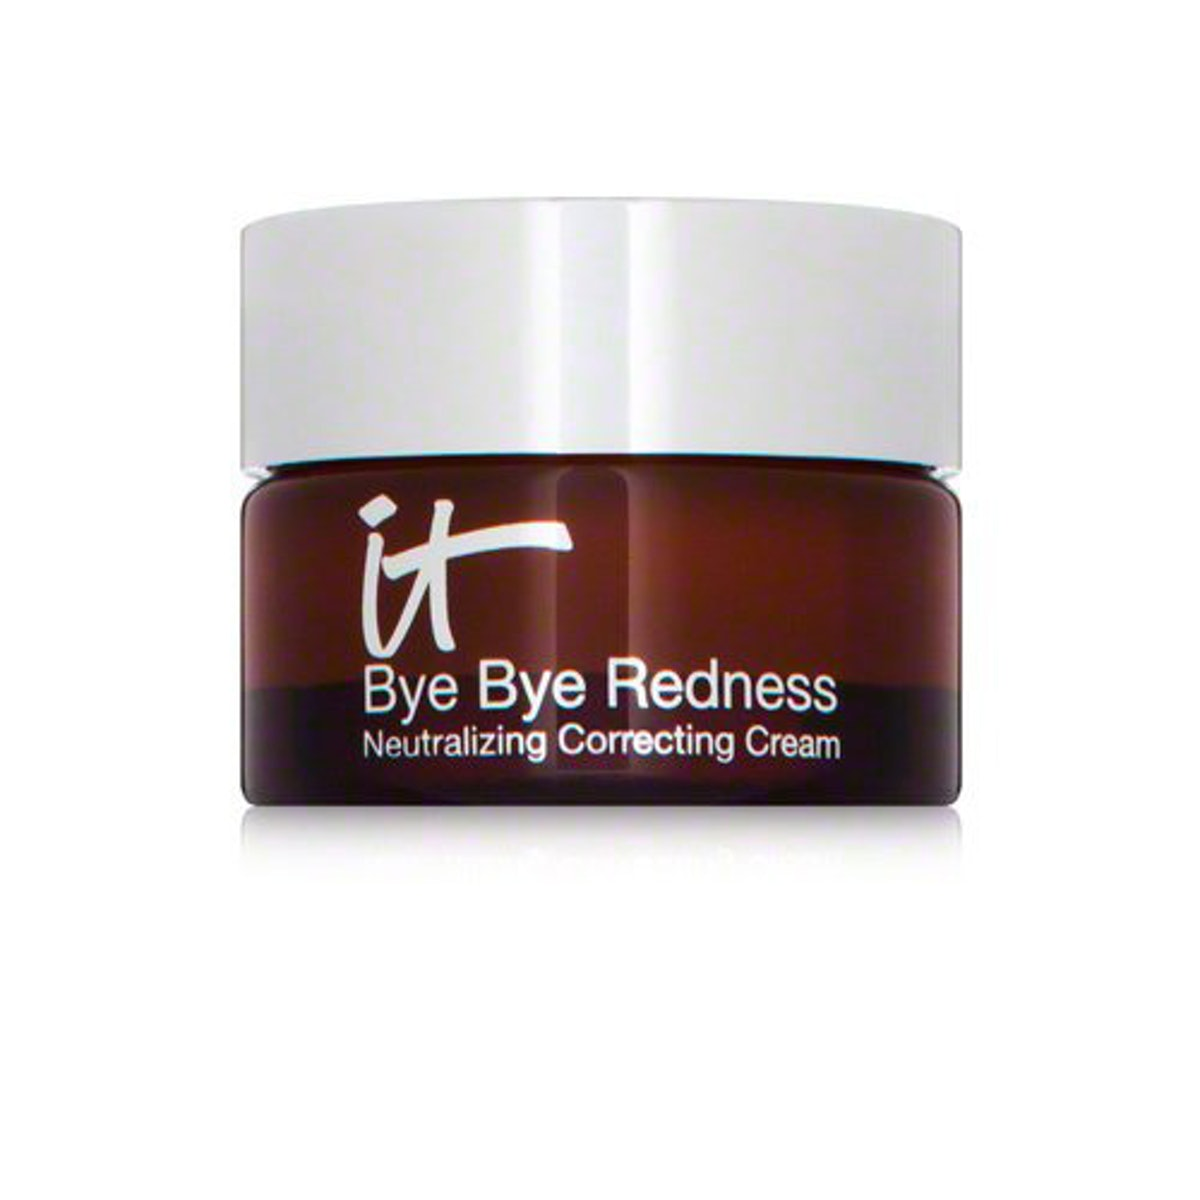 IT Cosmetics Bye Bye Redness Correcting Creme